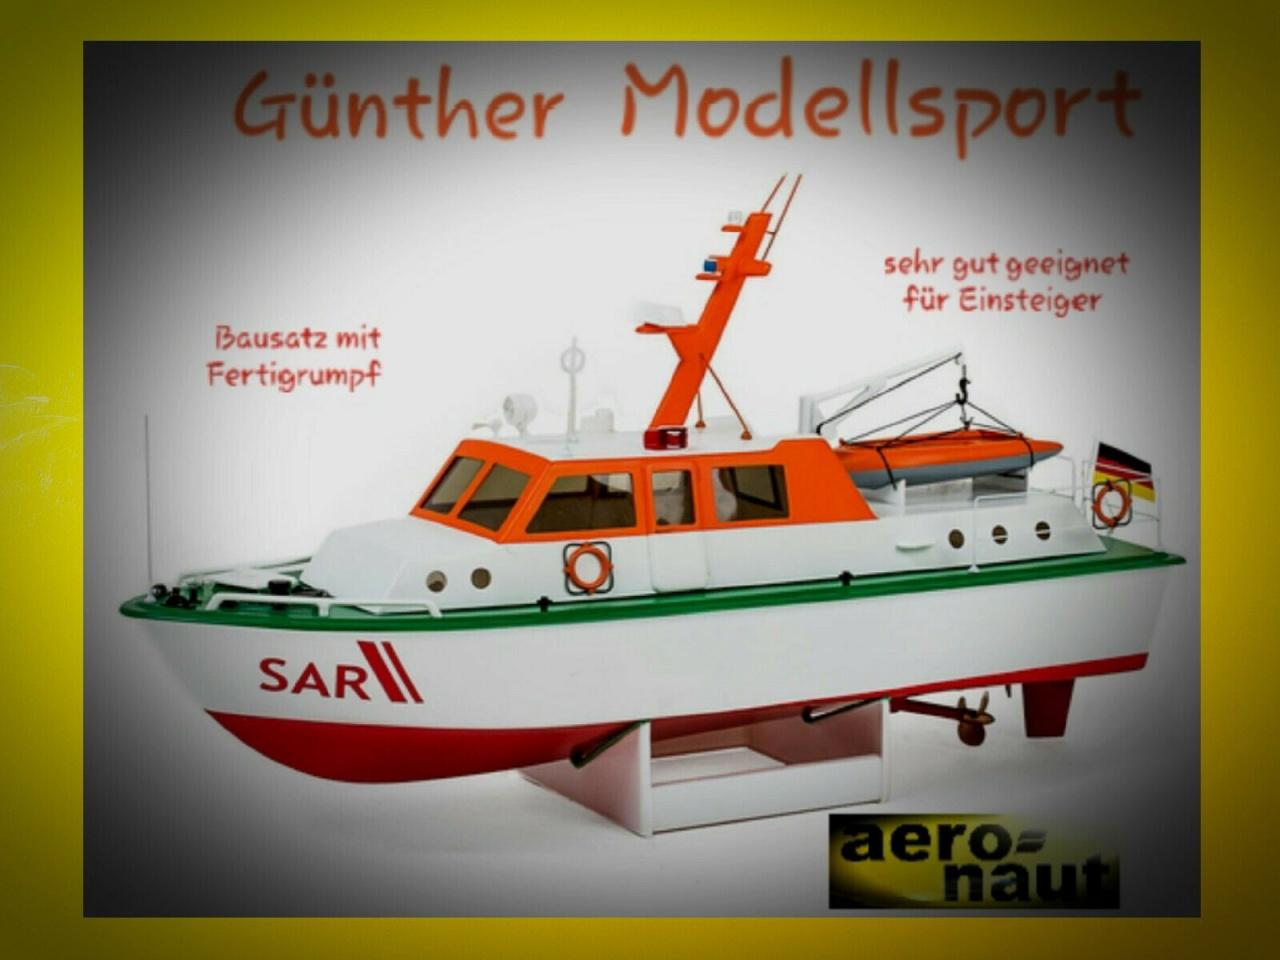 aeronaut Behördenschiff SAR Boot, 3061/00, Bausatz